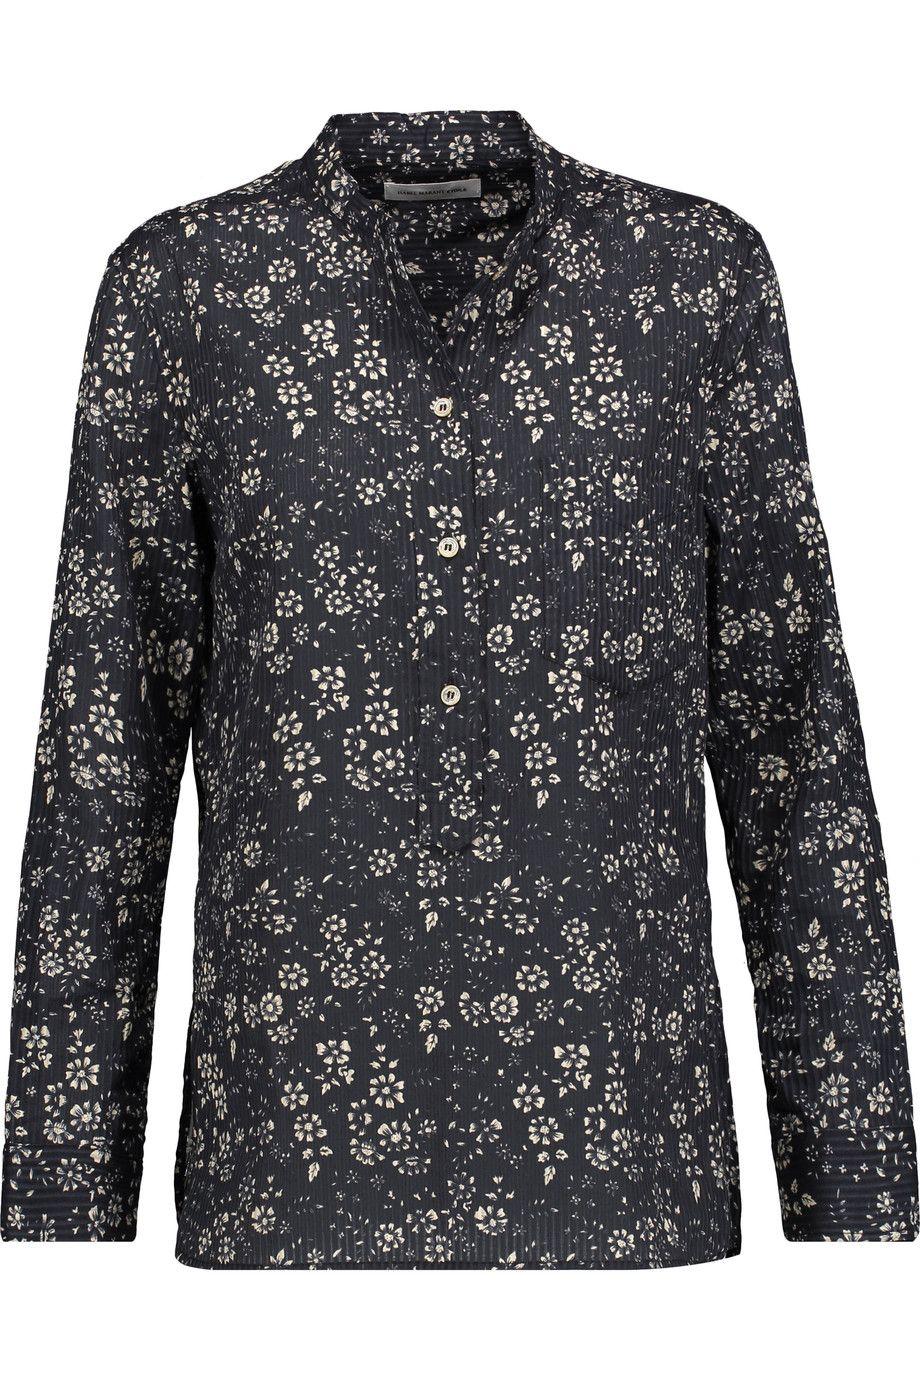 e986d665324 ETOILE ISABEL MARANT Brenda floral-print cotton shirt. #etoileisabelmarant  #cloth #shirt